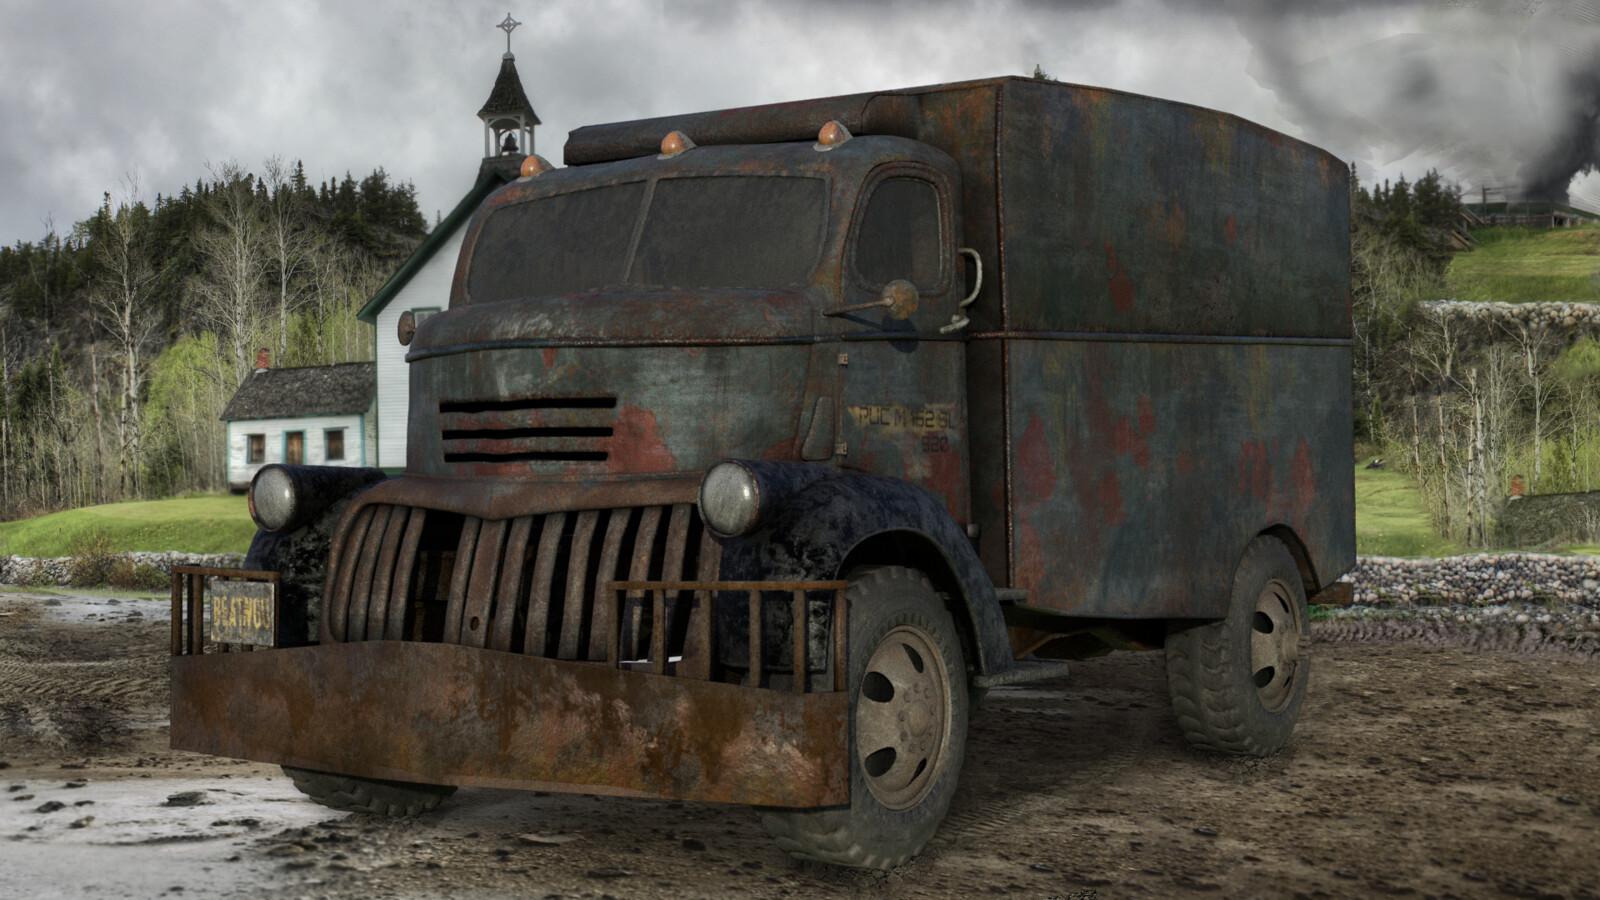 Carl's got to go home. Artstation Creeper S Truck Alex Ruas